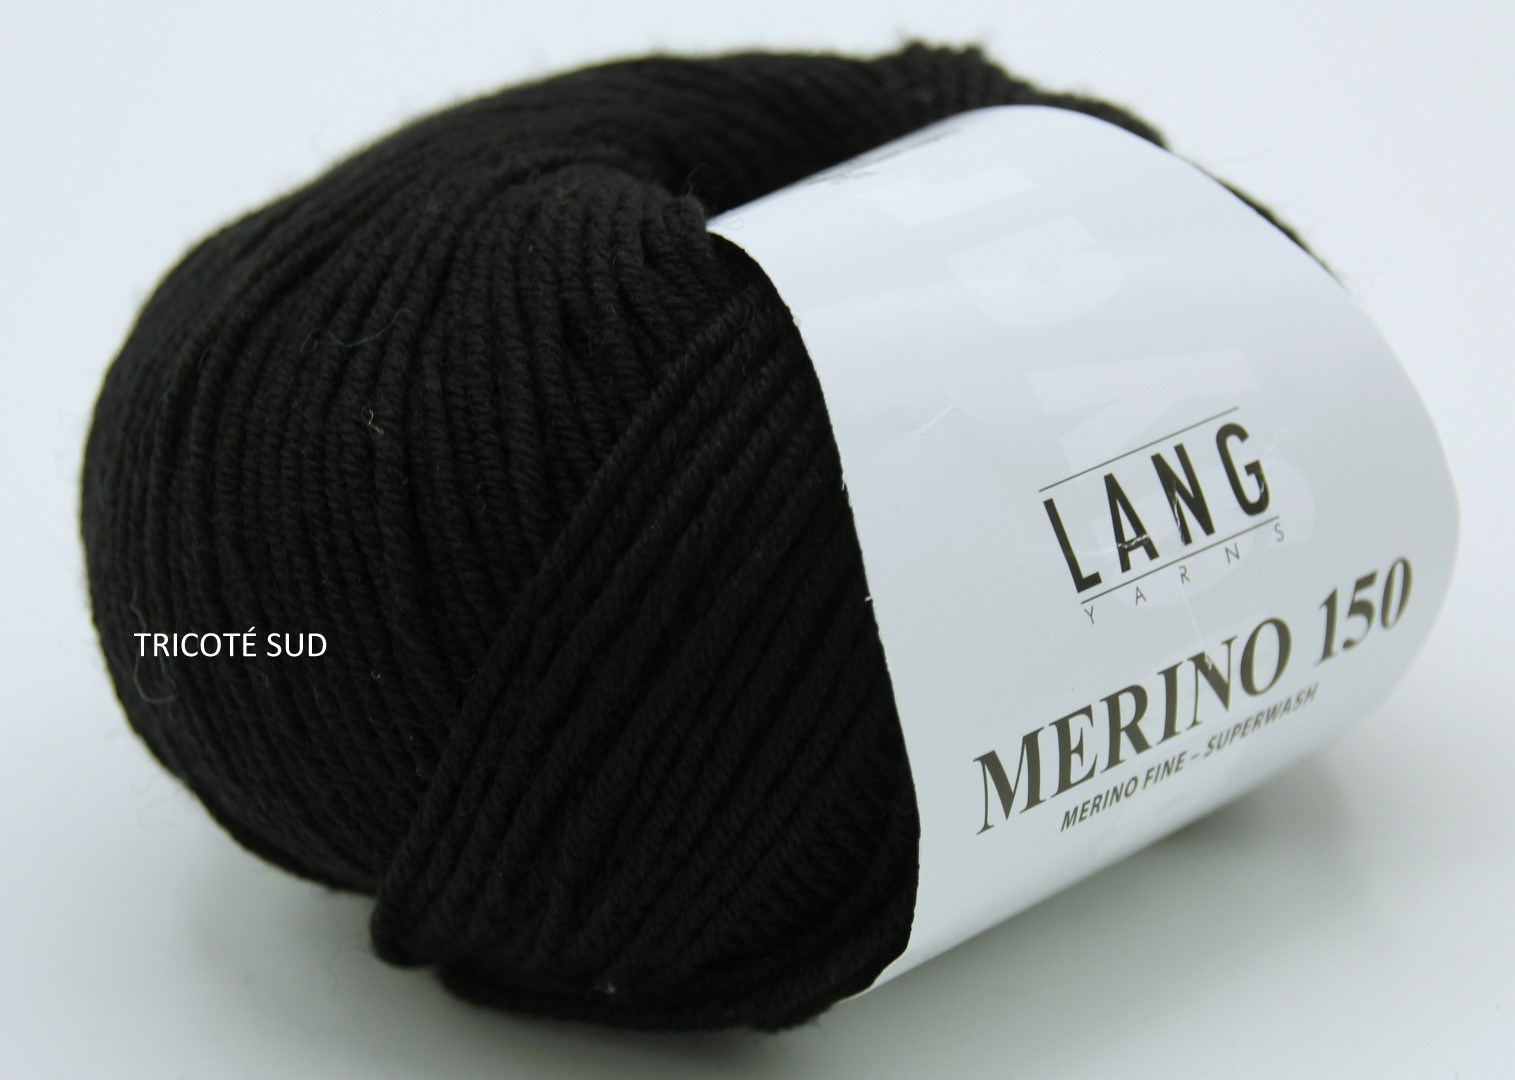 MERINO 150 LANG YARNS COLORIS 04 (Large)